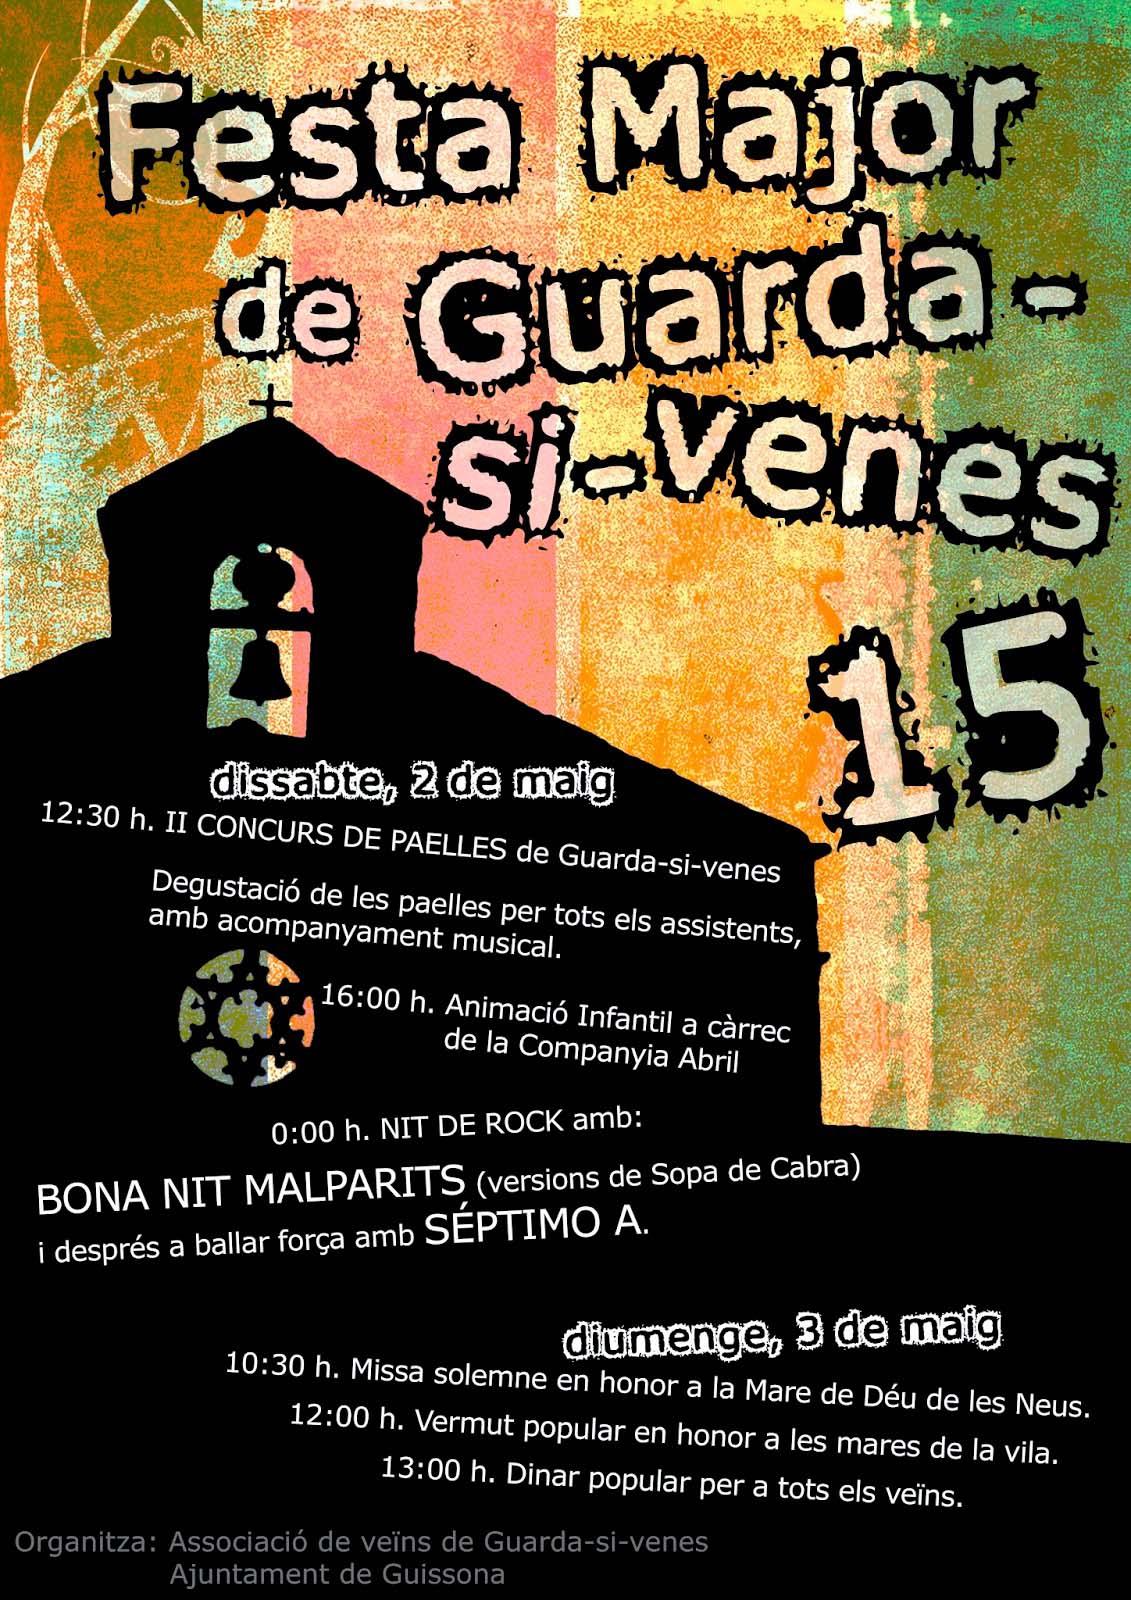 cartell Festa major de Guarda-si-venes 2015